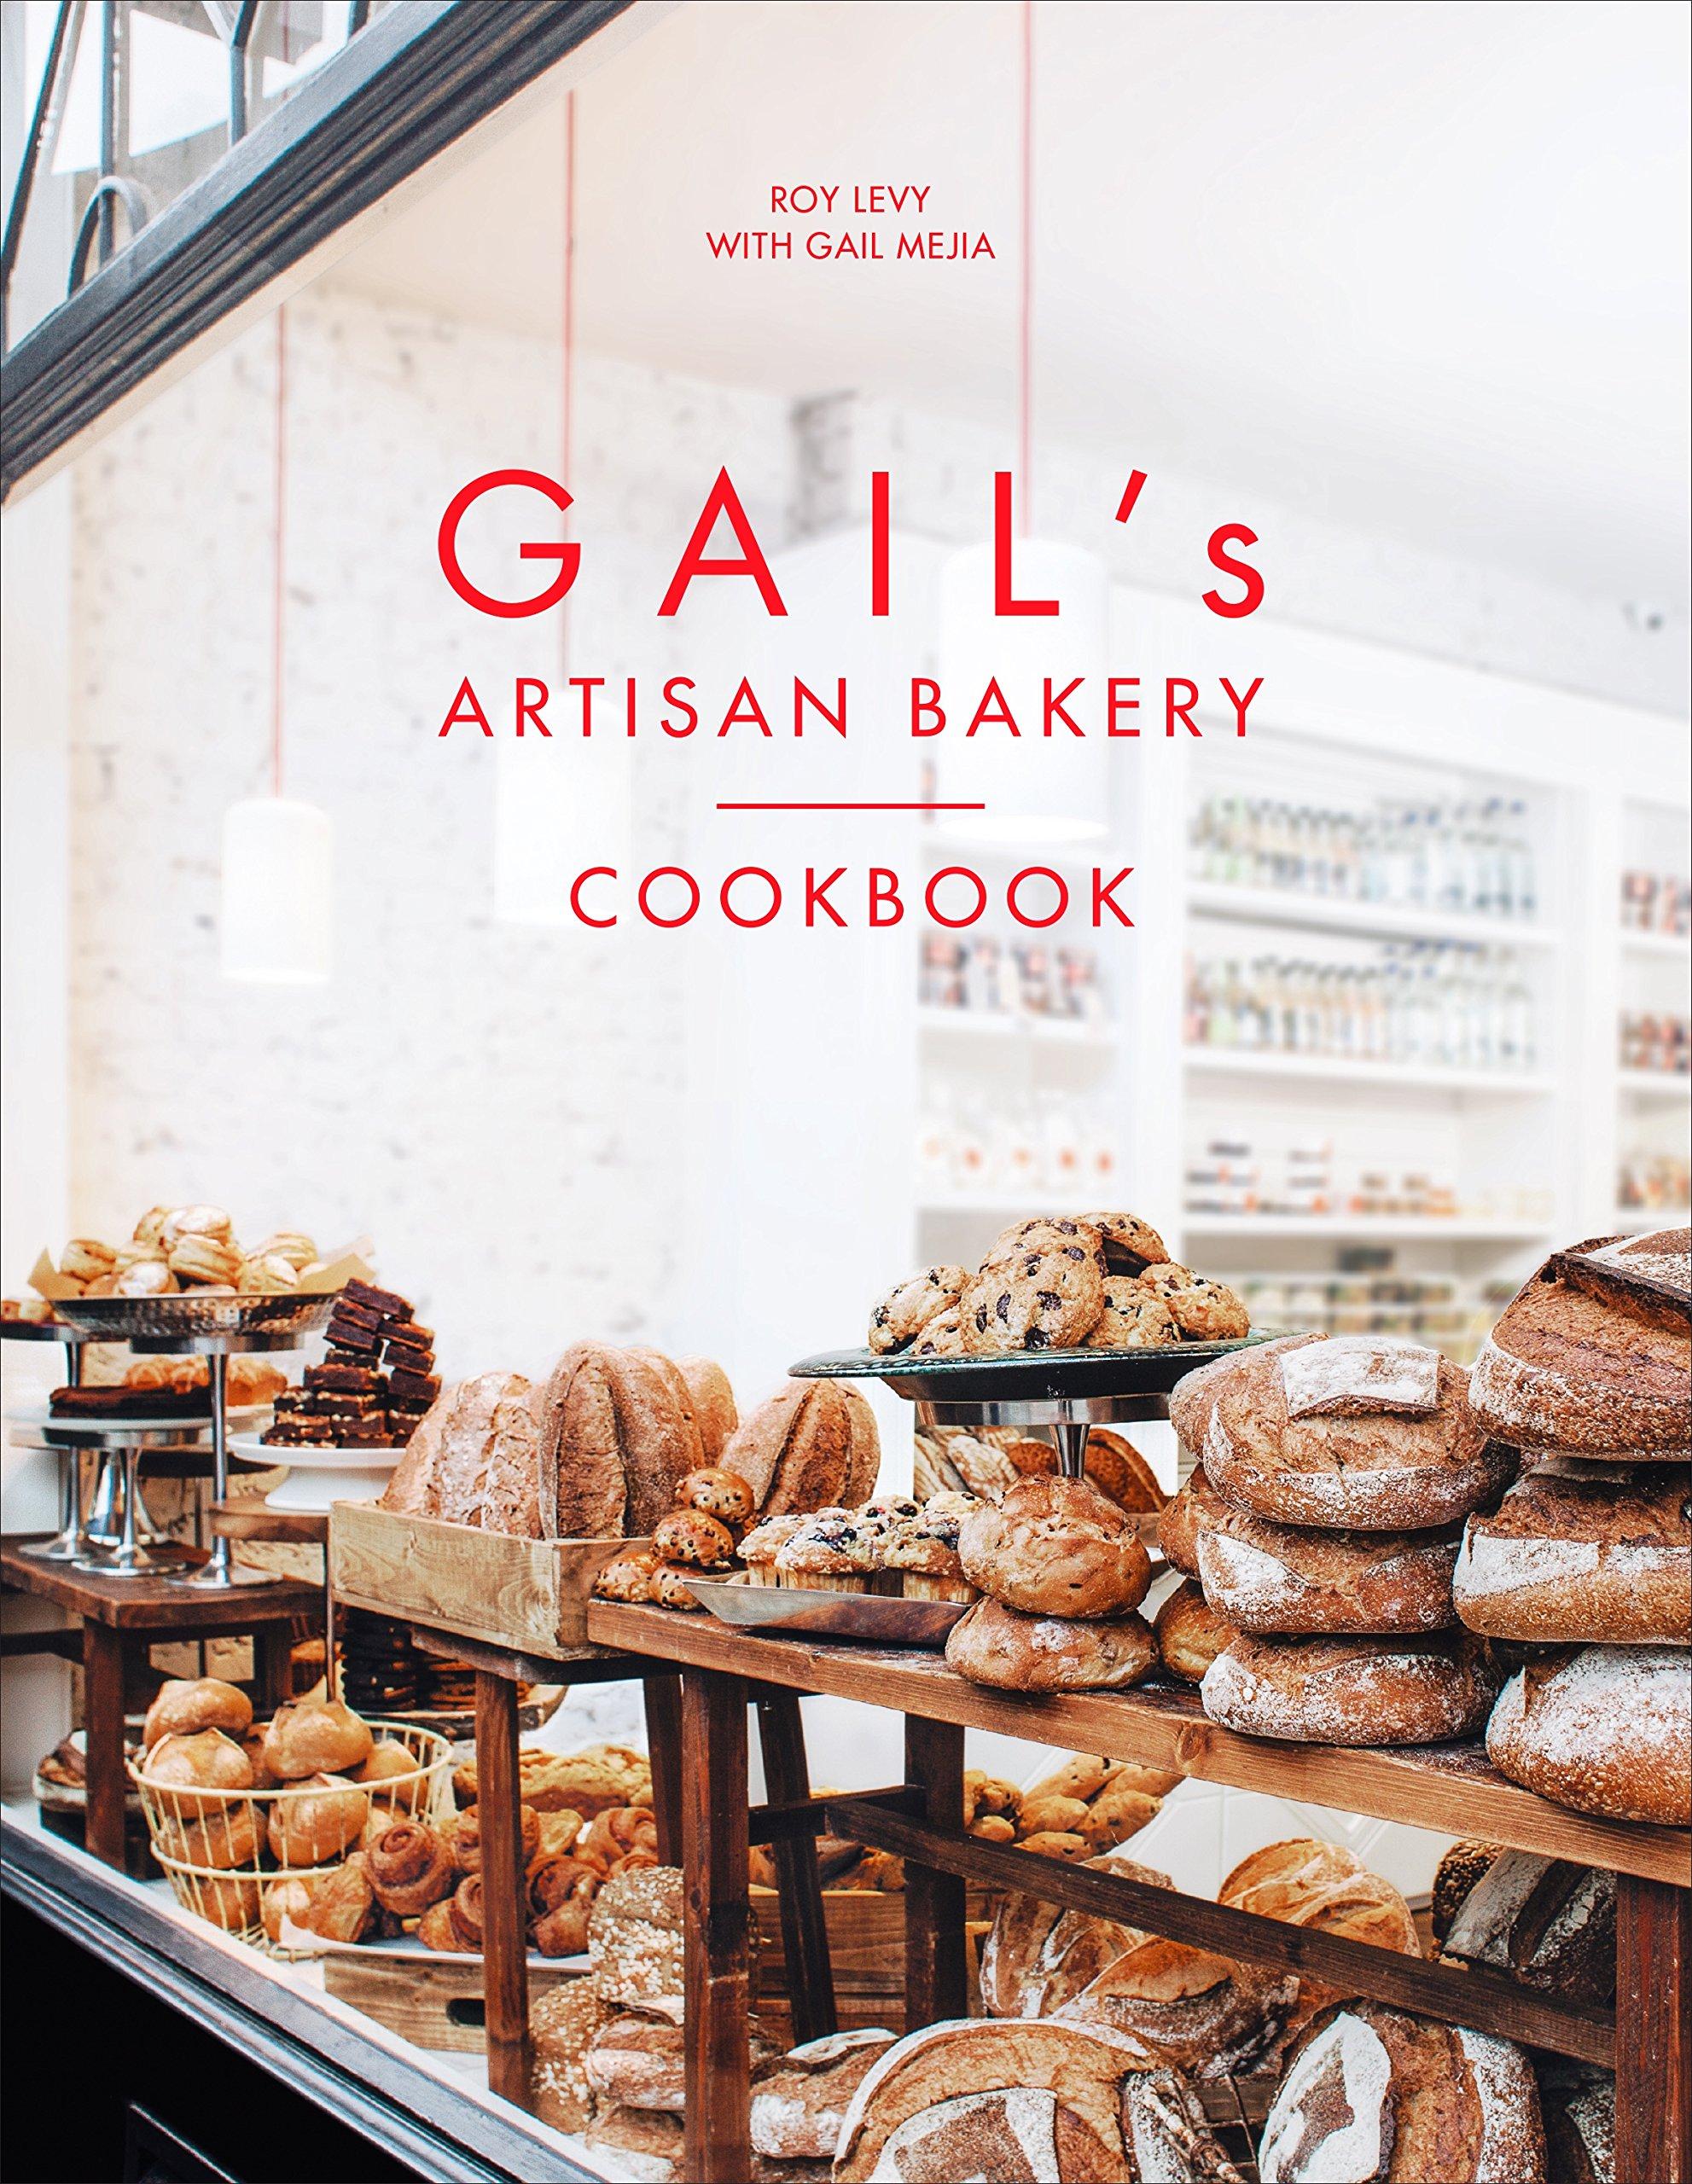 Gail's Artisan Bakery Cookbook by Ebury Press